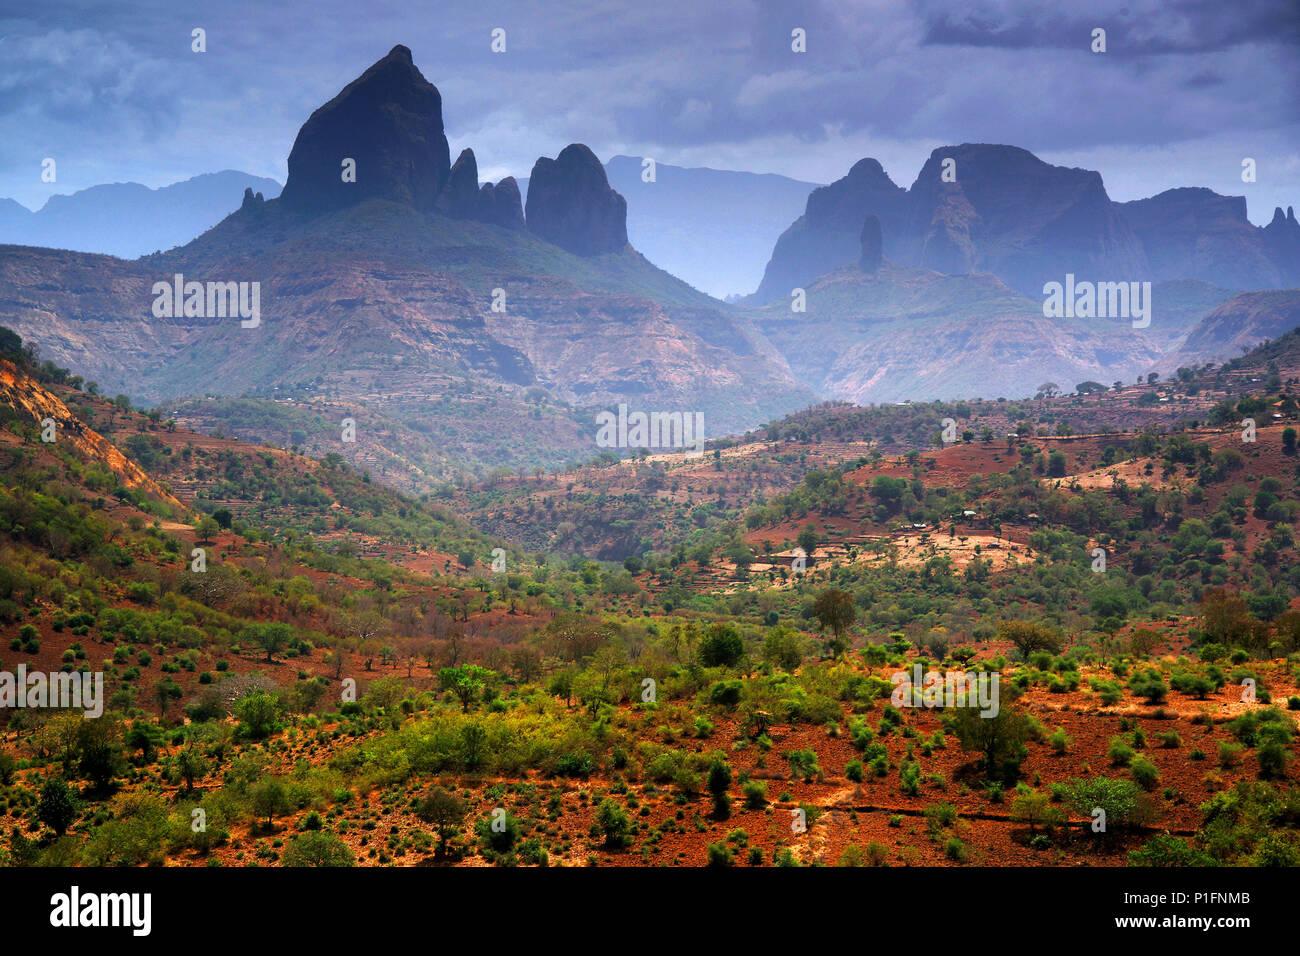 Africa, Ethiopia, Simien Mountains,, Afrika, Aethiopien, Simien Gebirge, - Stock Image